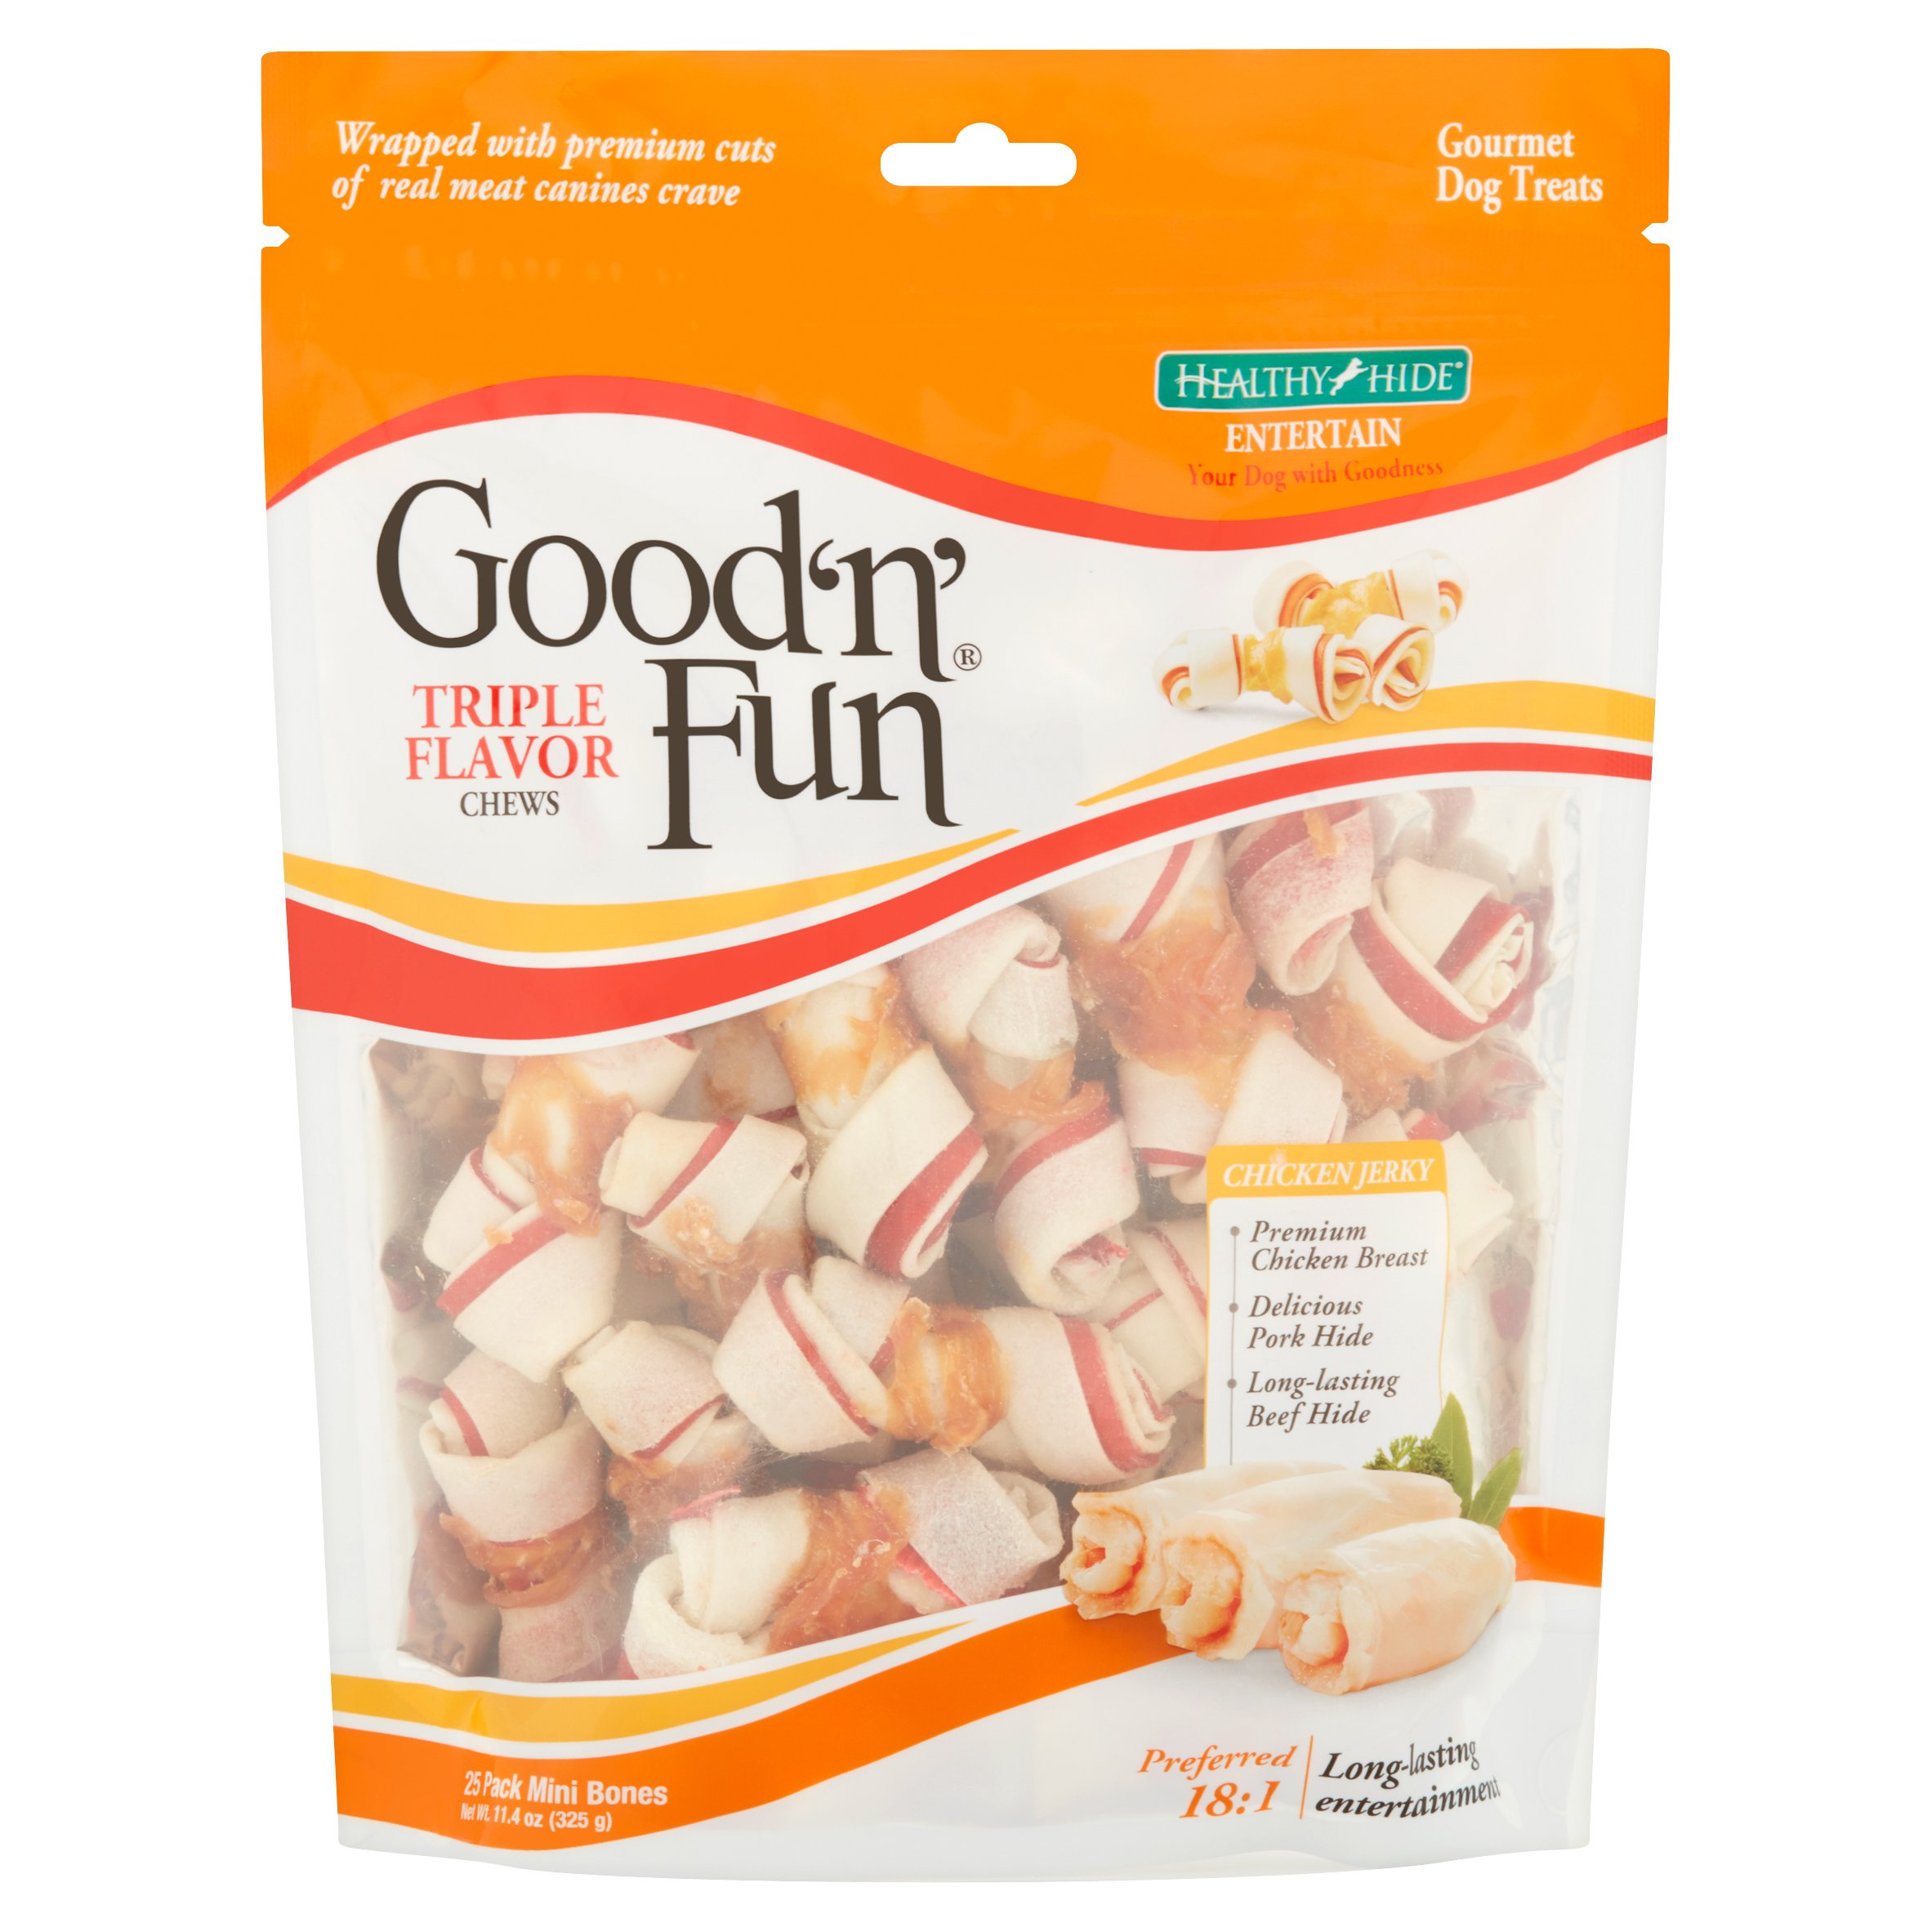 Healthy Hide Good'n'Fun Triple Flavor Gourmet Dog Treats, 25-Count